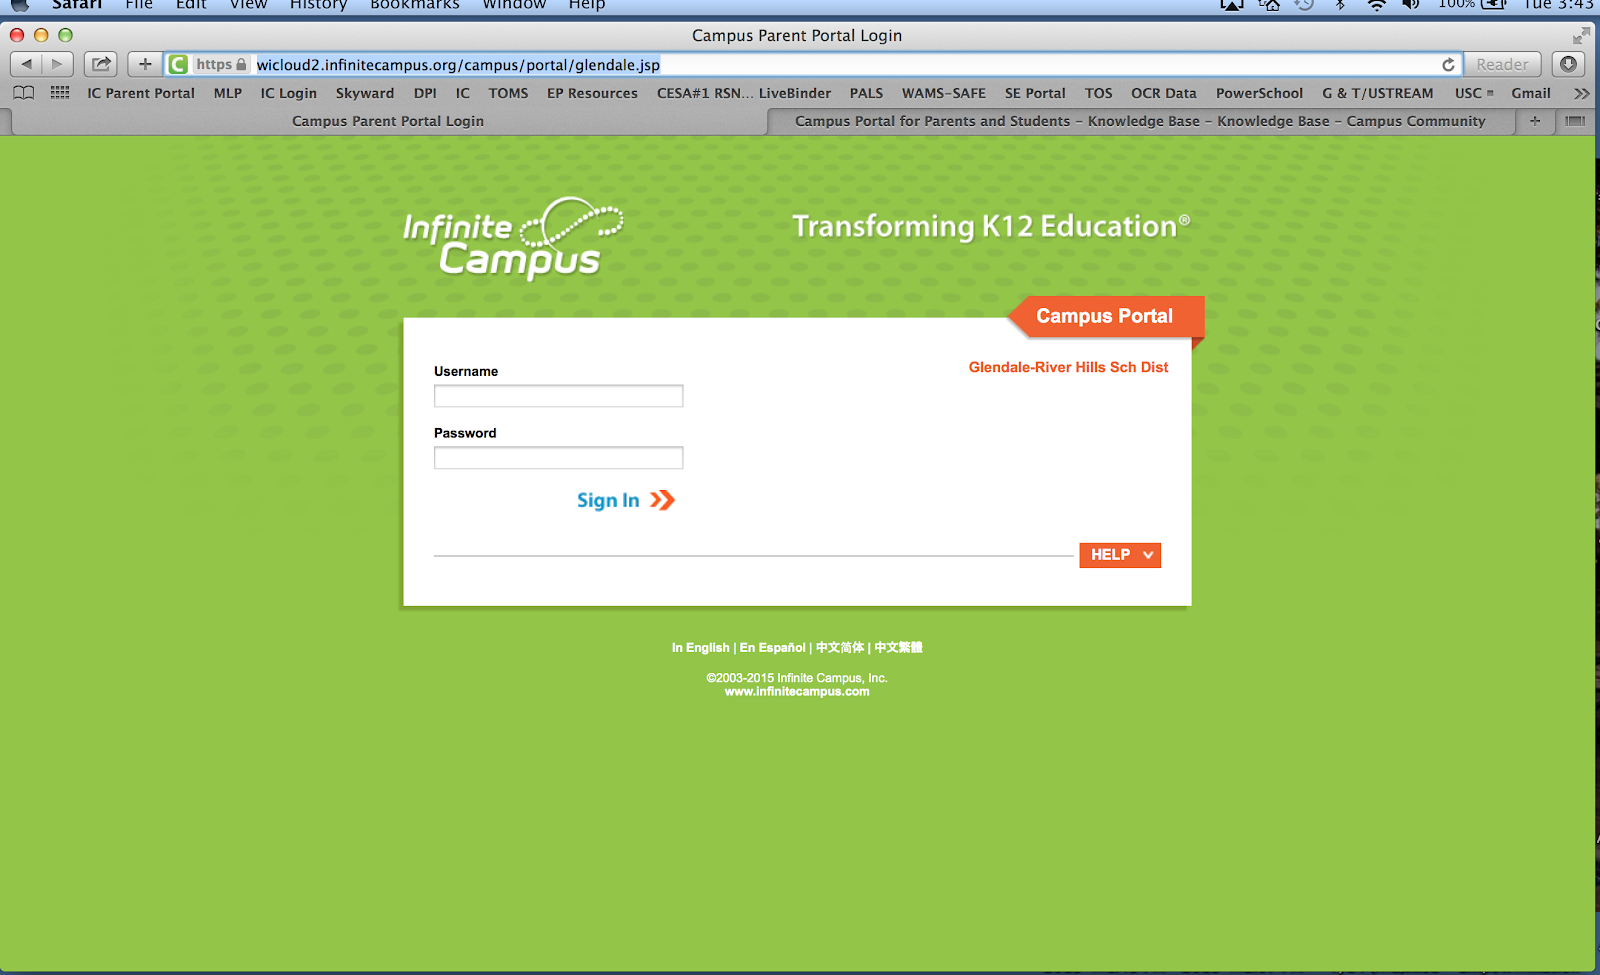 Infinite Campus FAQs - Glendale-River Hills School District